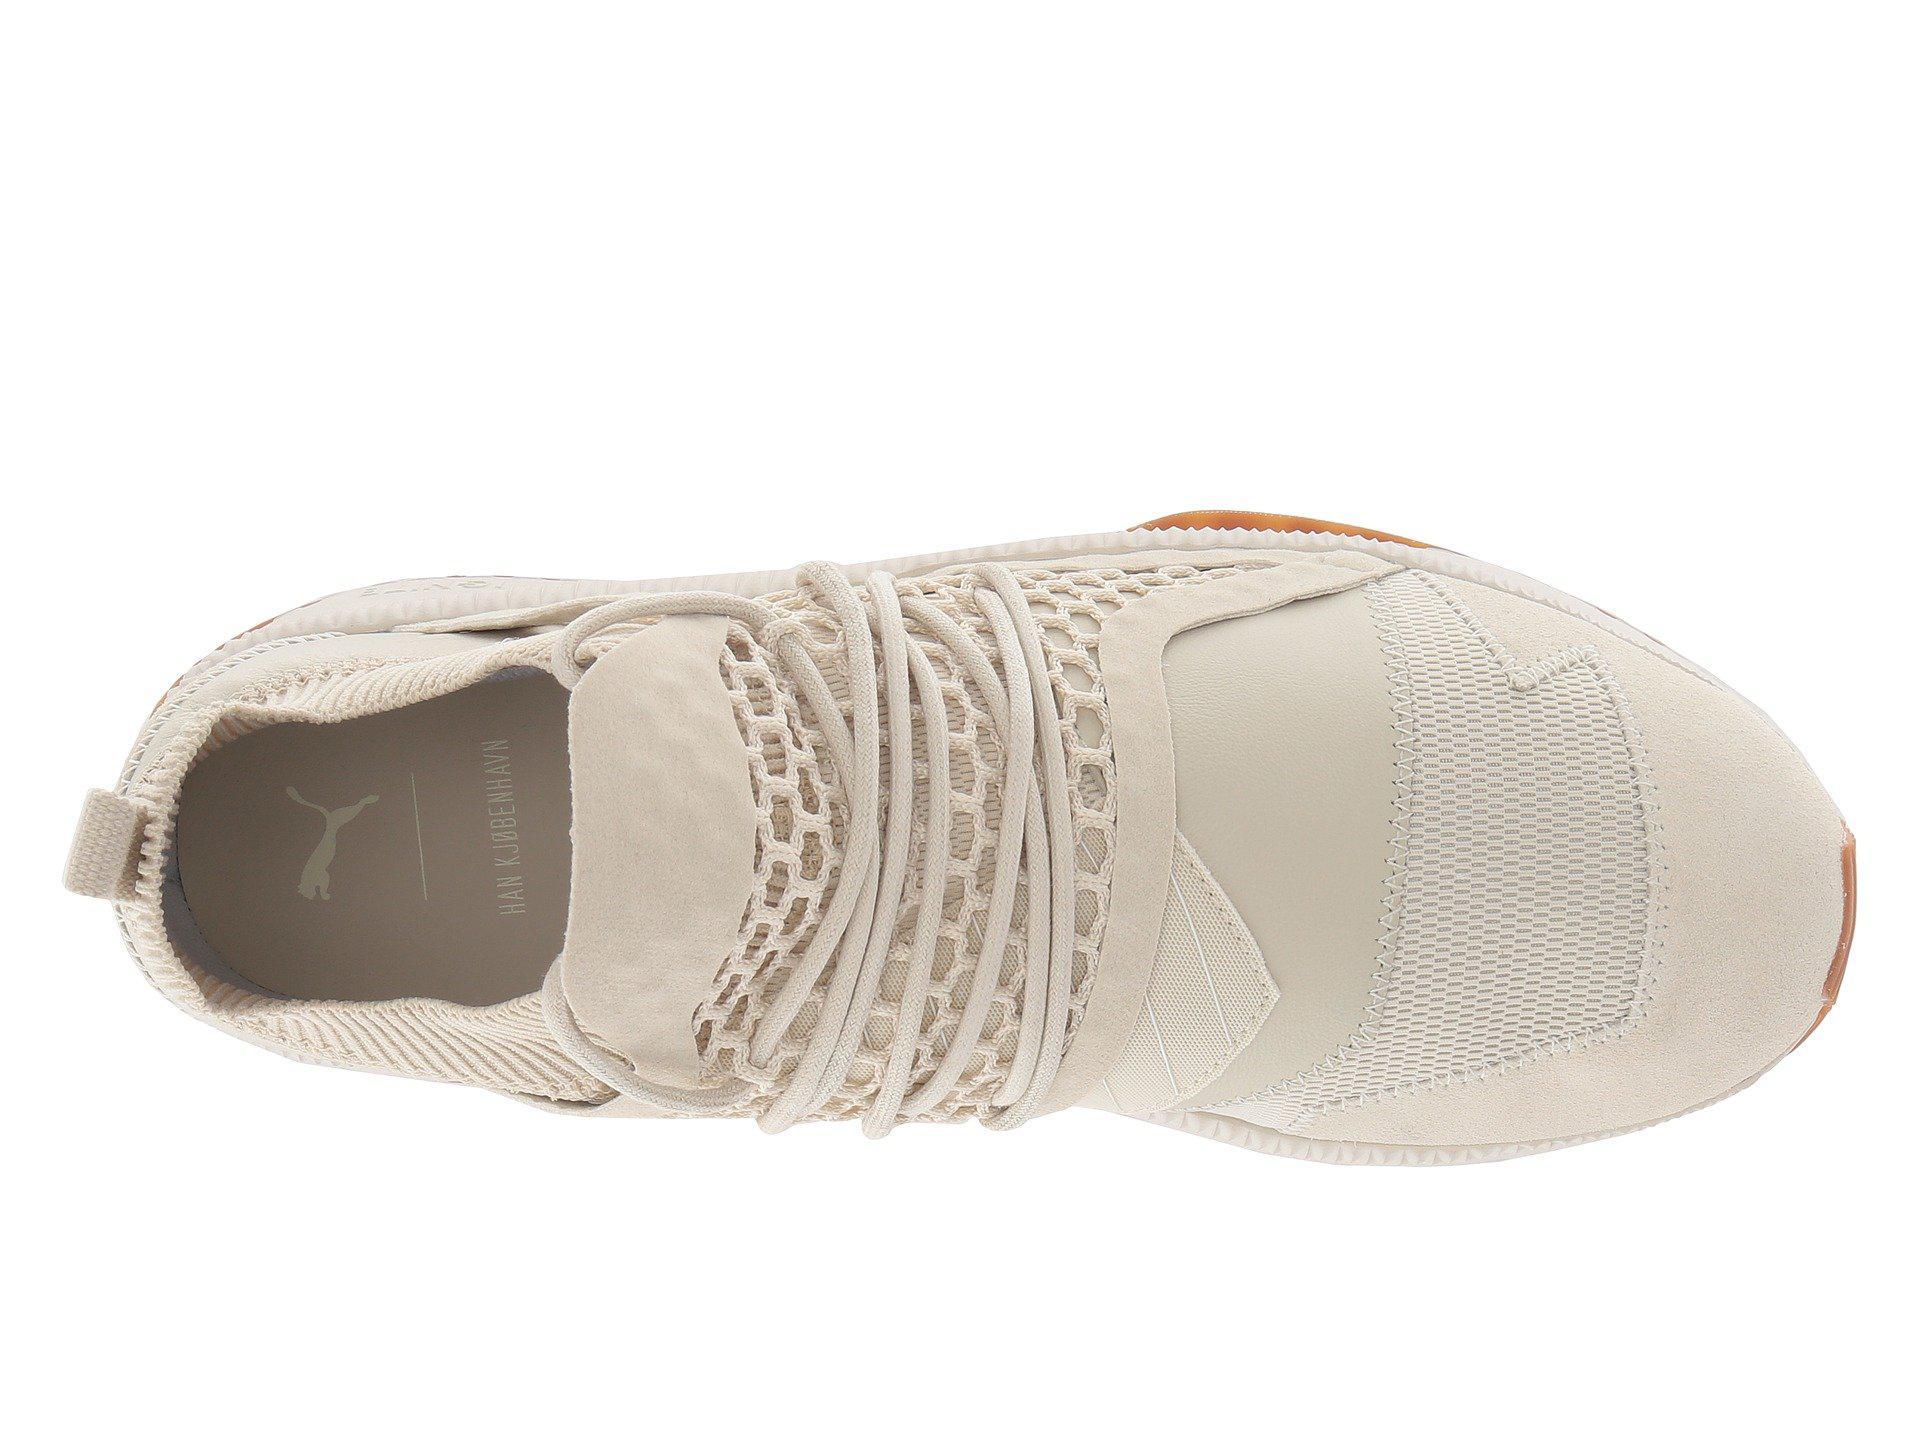 e8d79e1981e792 PUMA - Multicolor X Han Kjobenhavn Tsugi Netfit Sneaker (silver Birch)  Men s Shoes for. View fullscreen